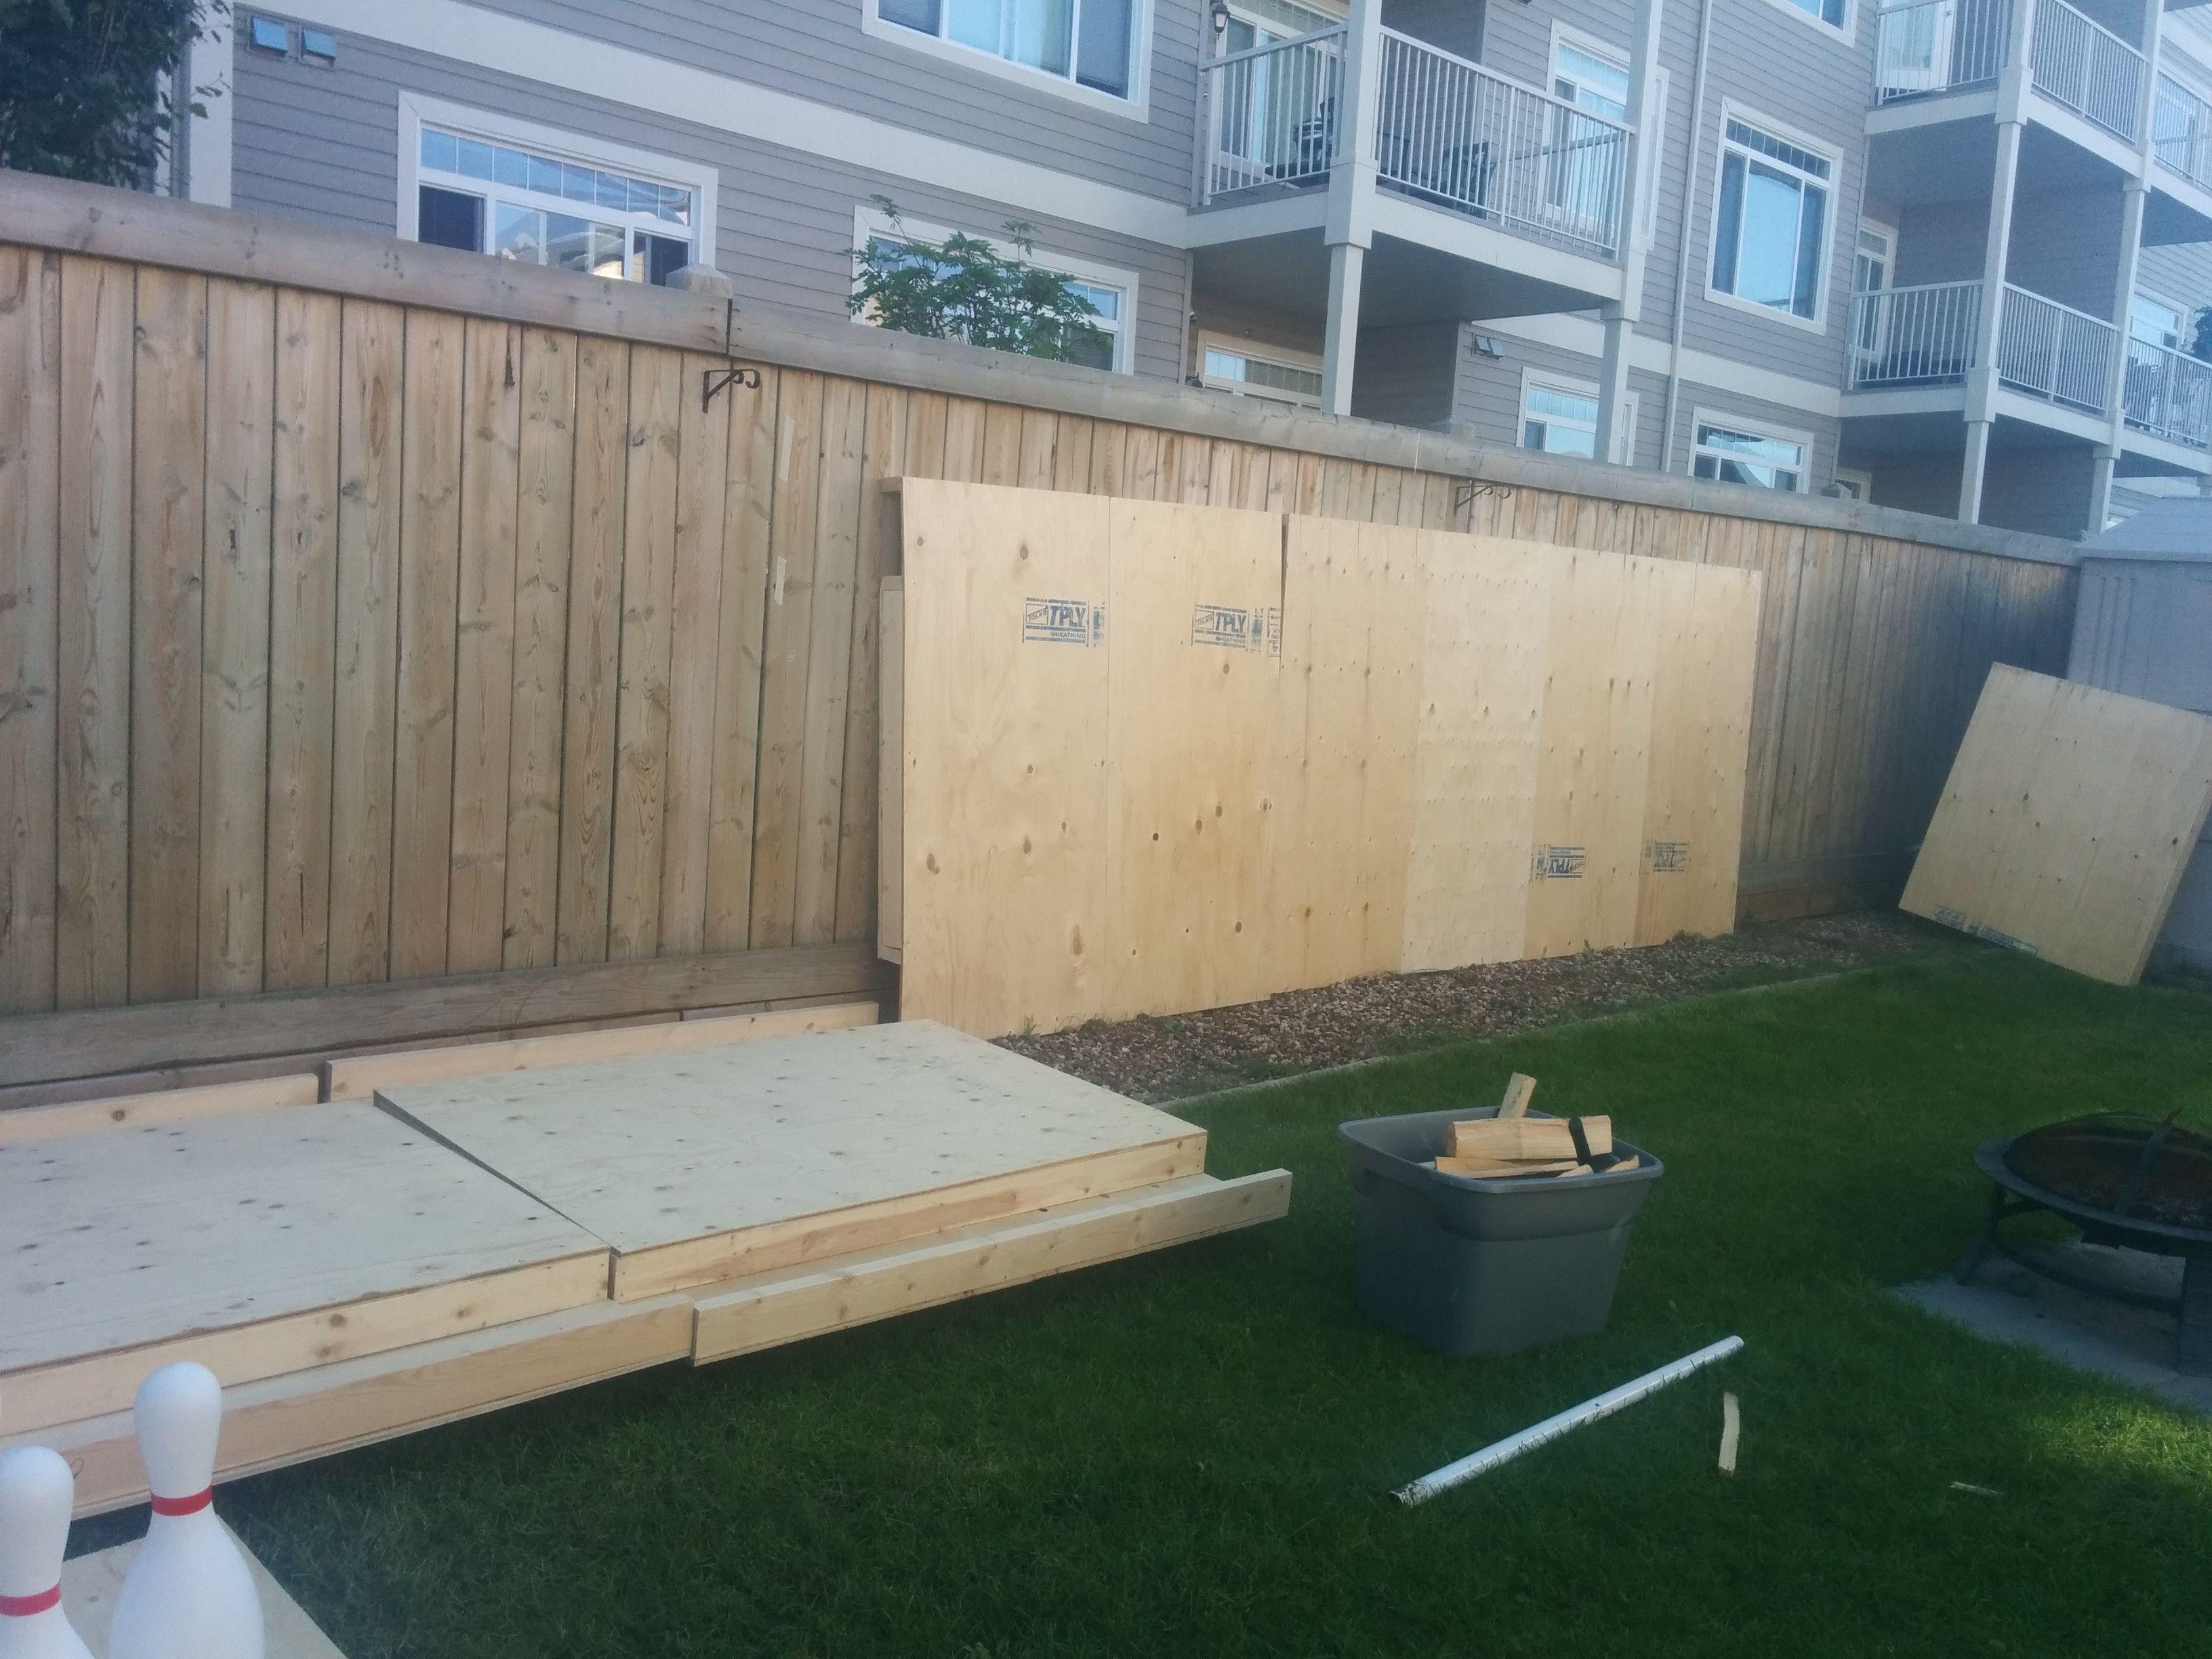 DIY Backyard Bowling Alley | Diy backyard, Backyard ...